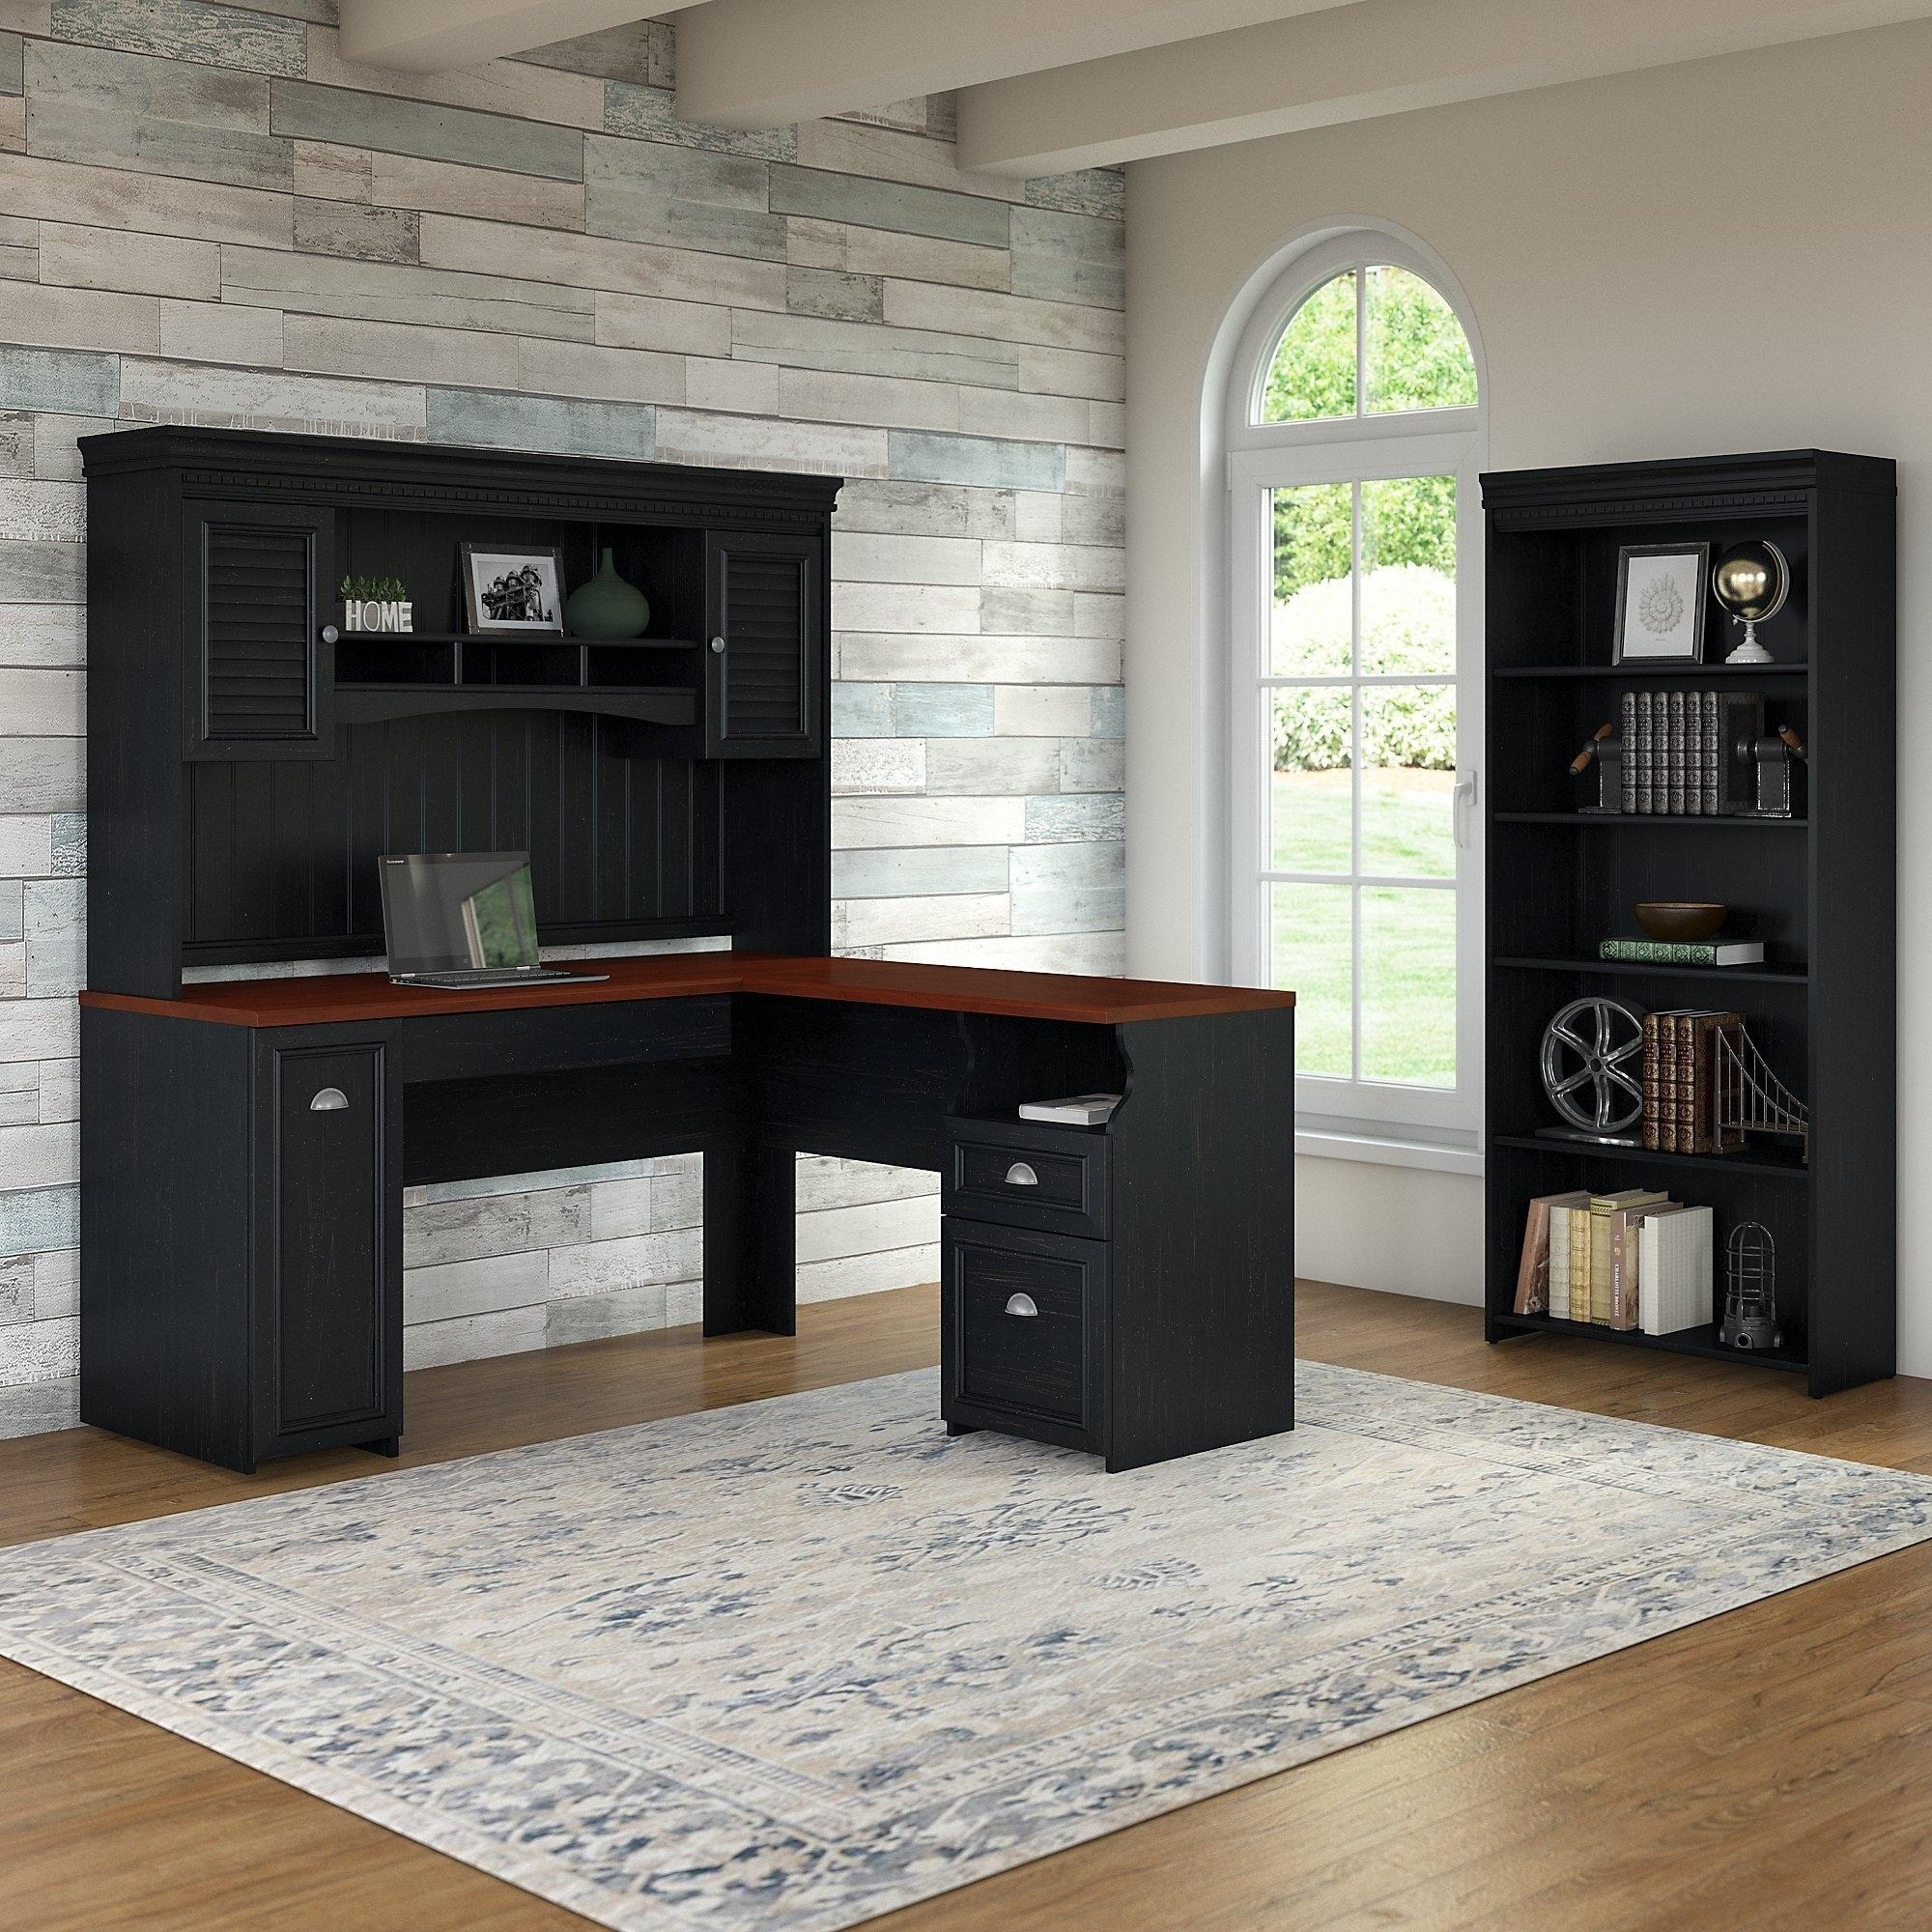 Copper Grove Khashuri Black L-shaped Desk with Hutch and 5-Shelf Bookcase (L Shaped - Black)